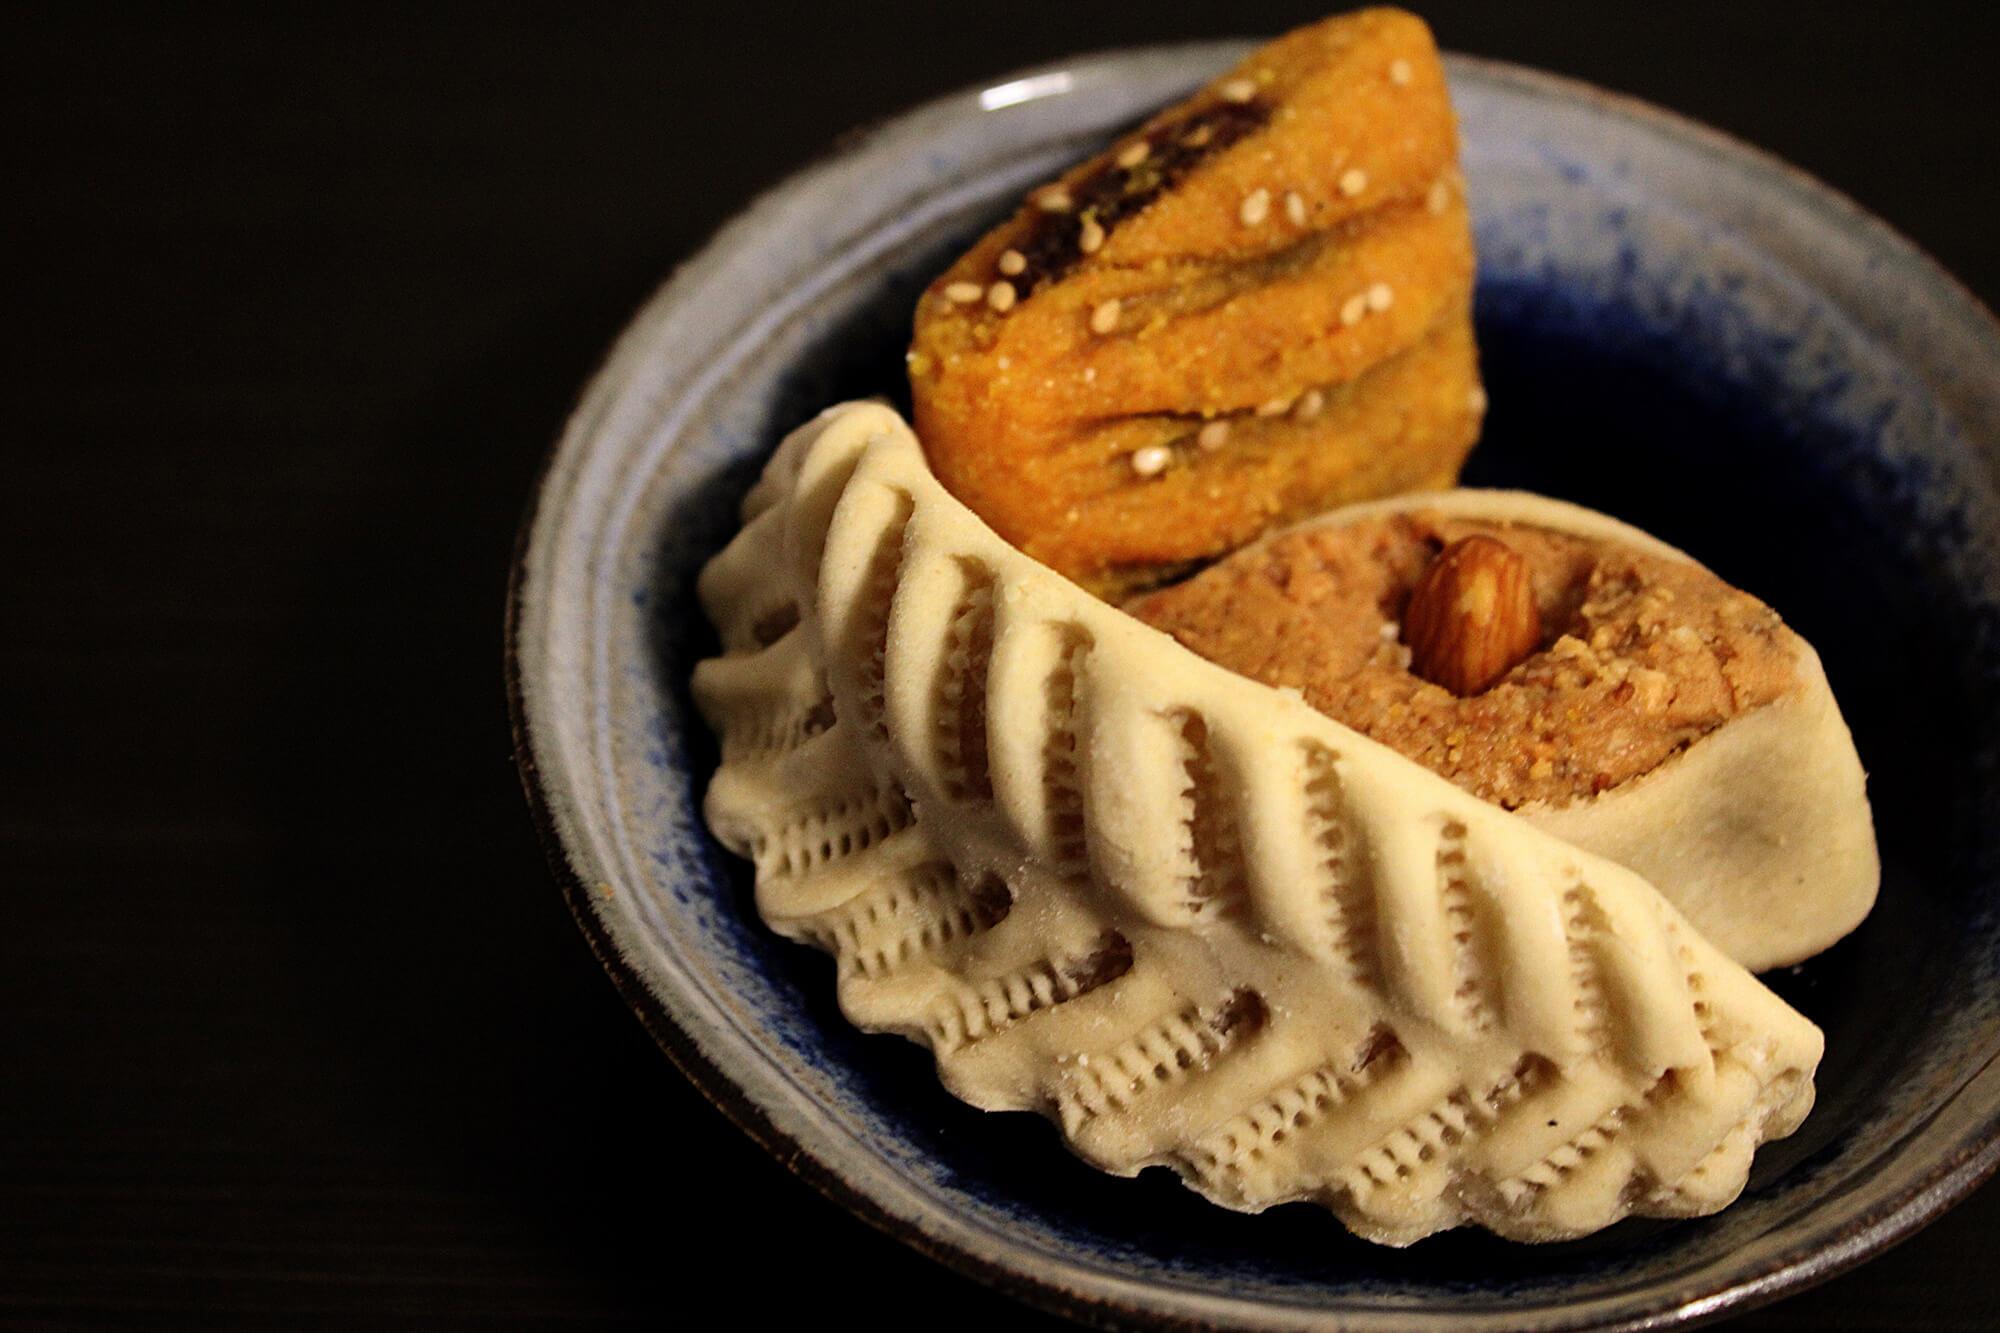 Sahara Desert Tour - Cuisine of Morocco - Desserts